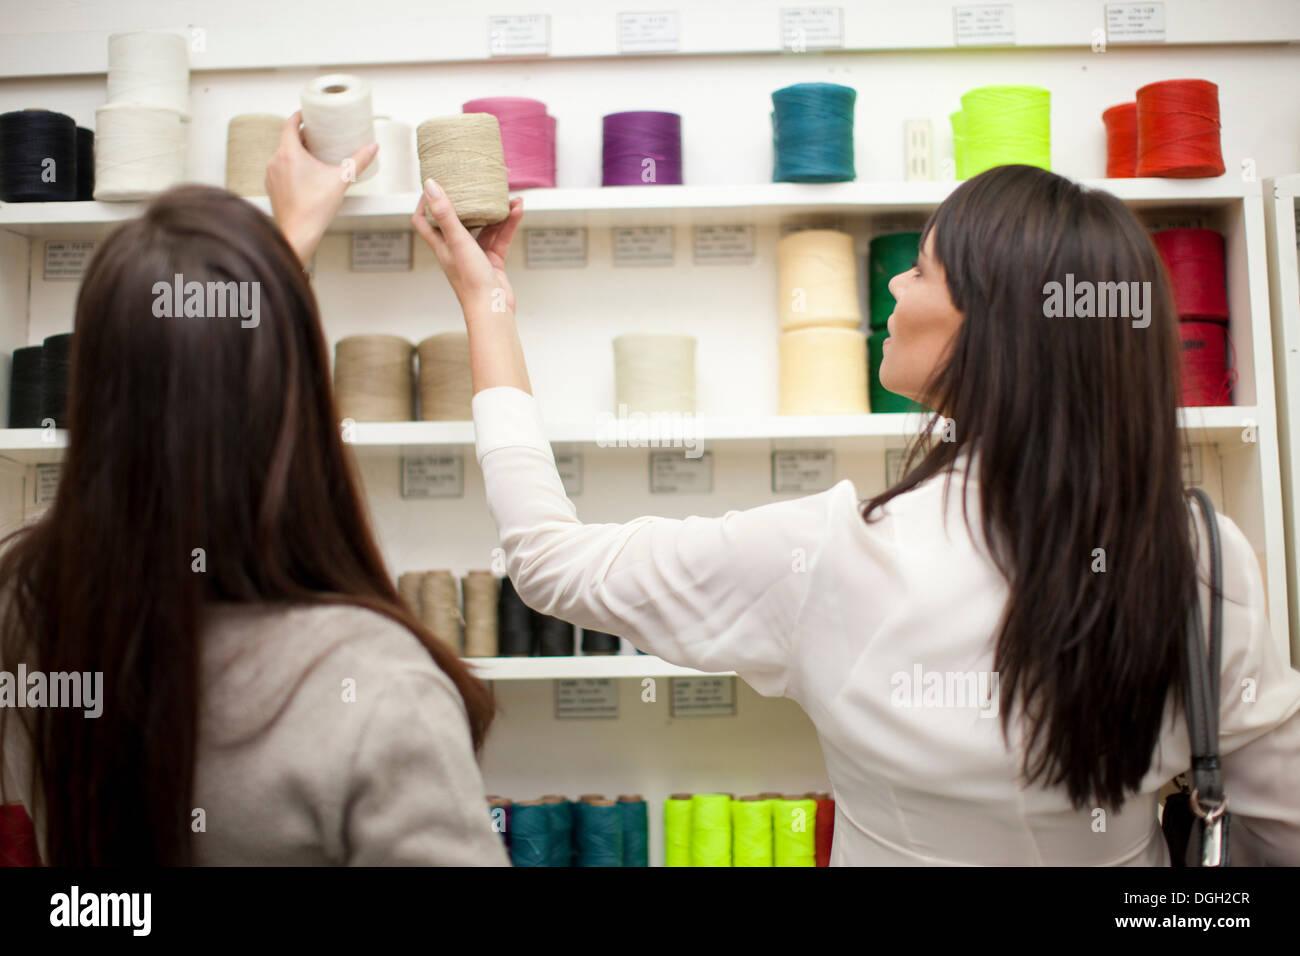 Women choosing spool of thread in store - Stock Image